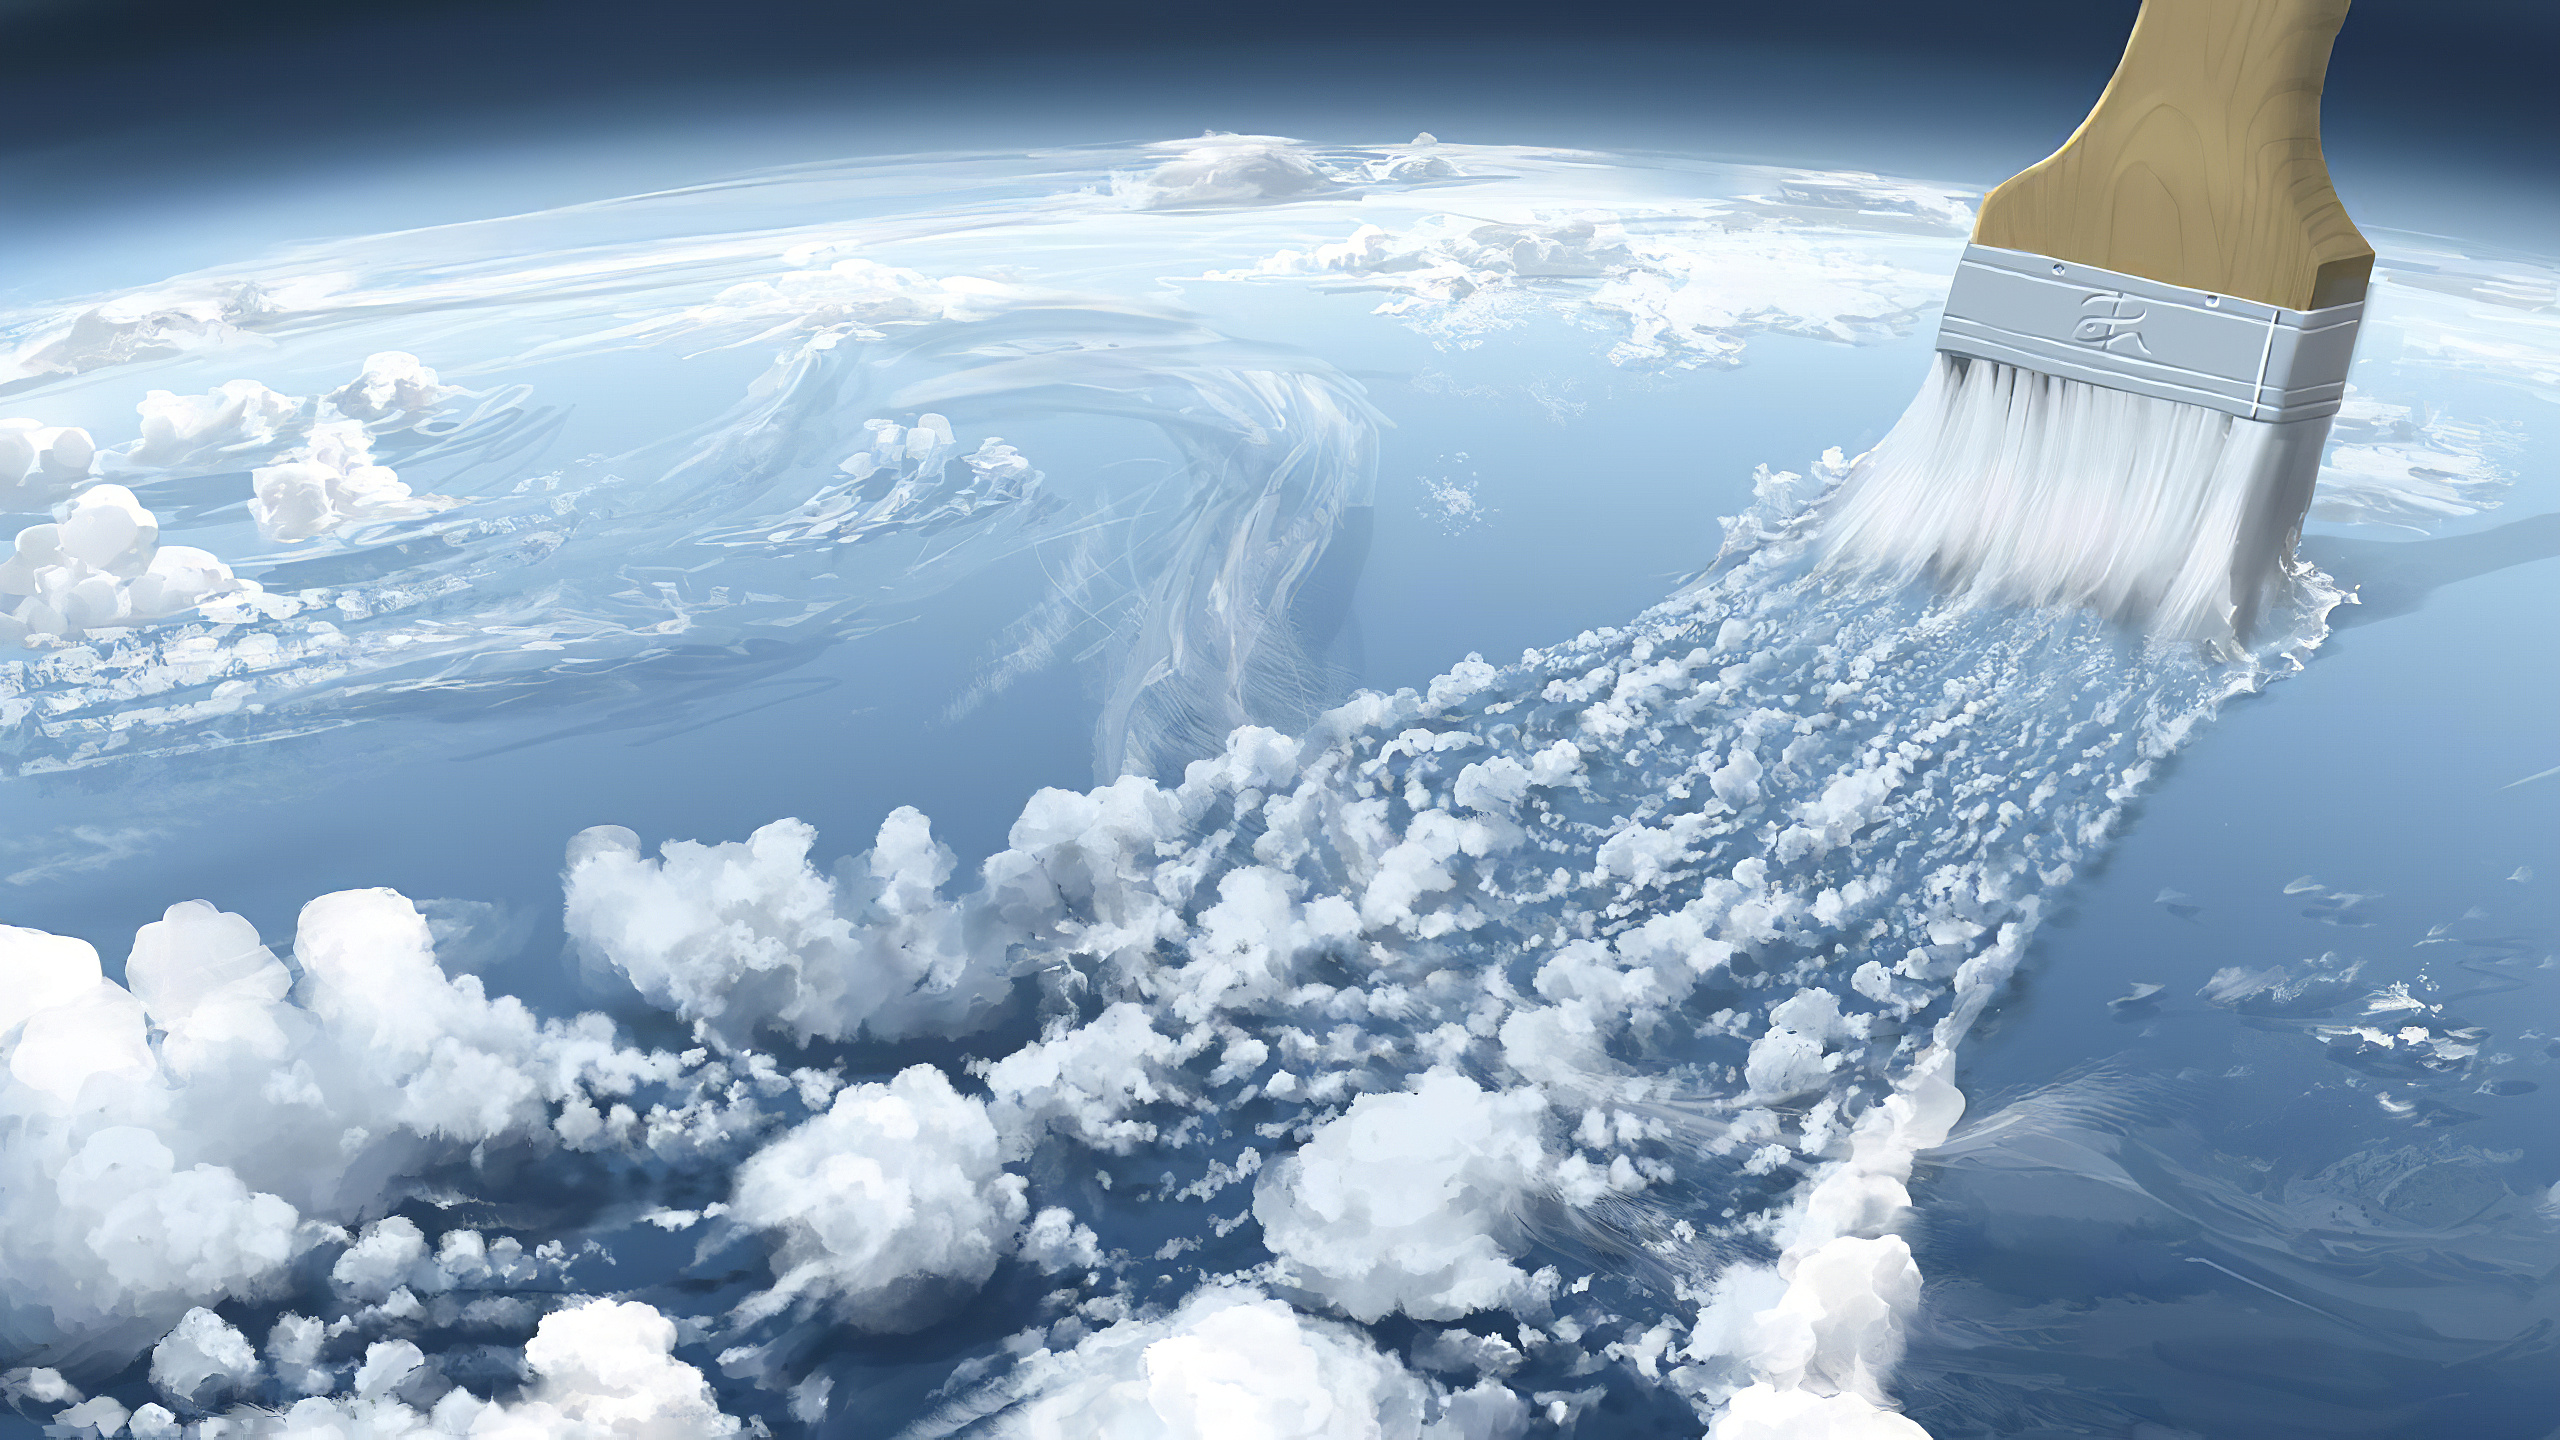 General 2560x1440 planet Earth space brush clouds digital art space art